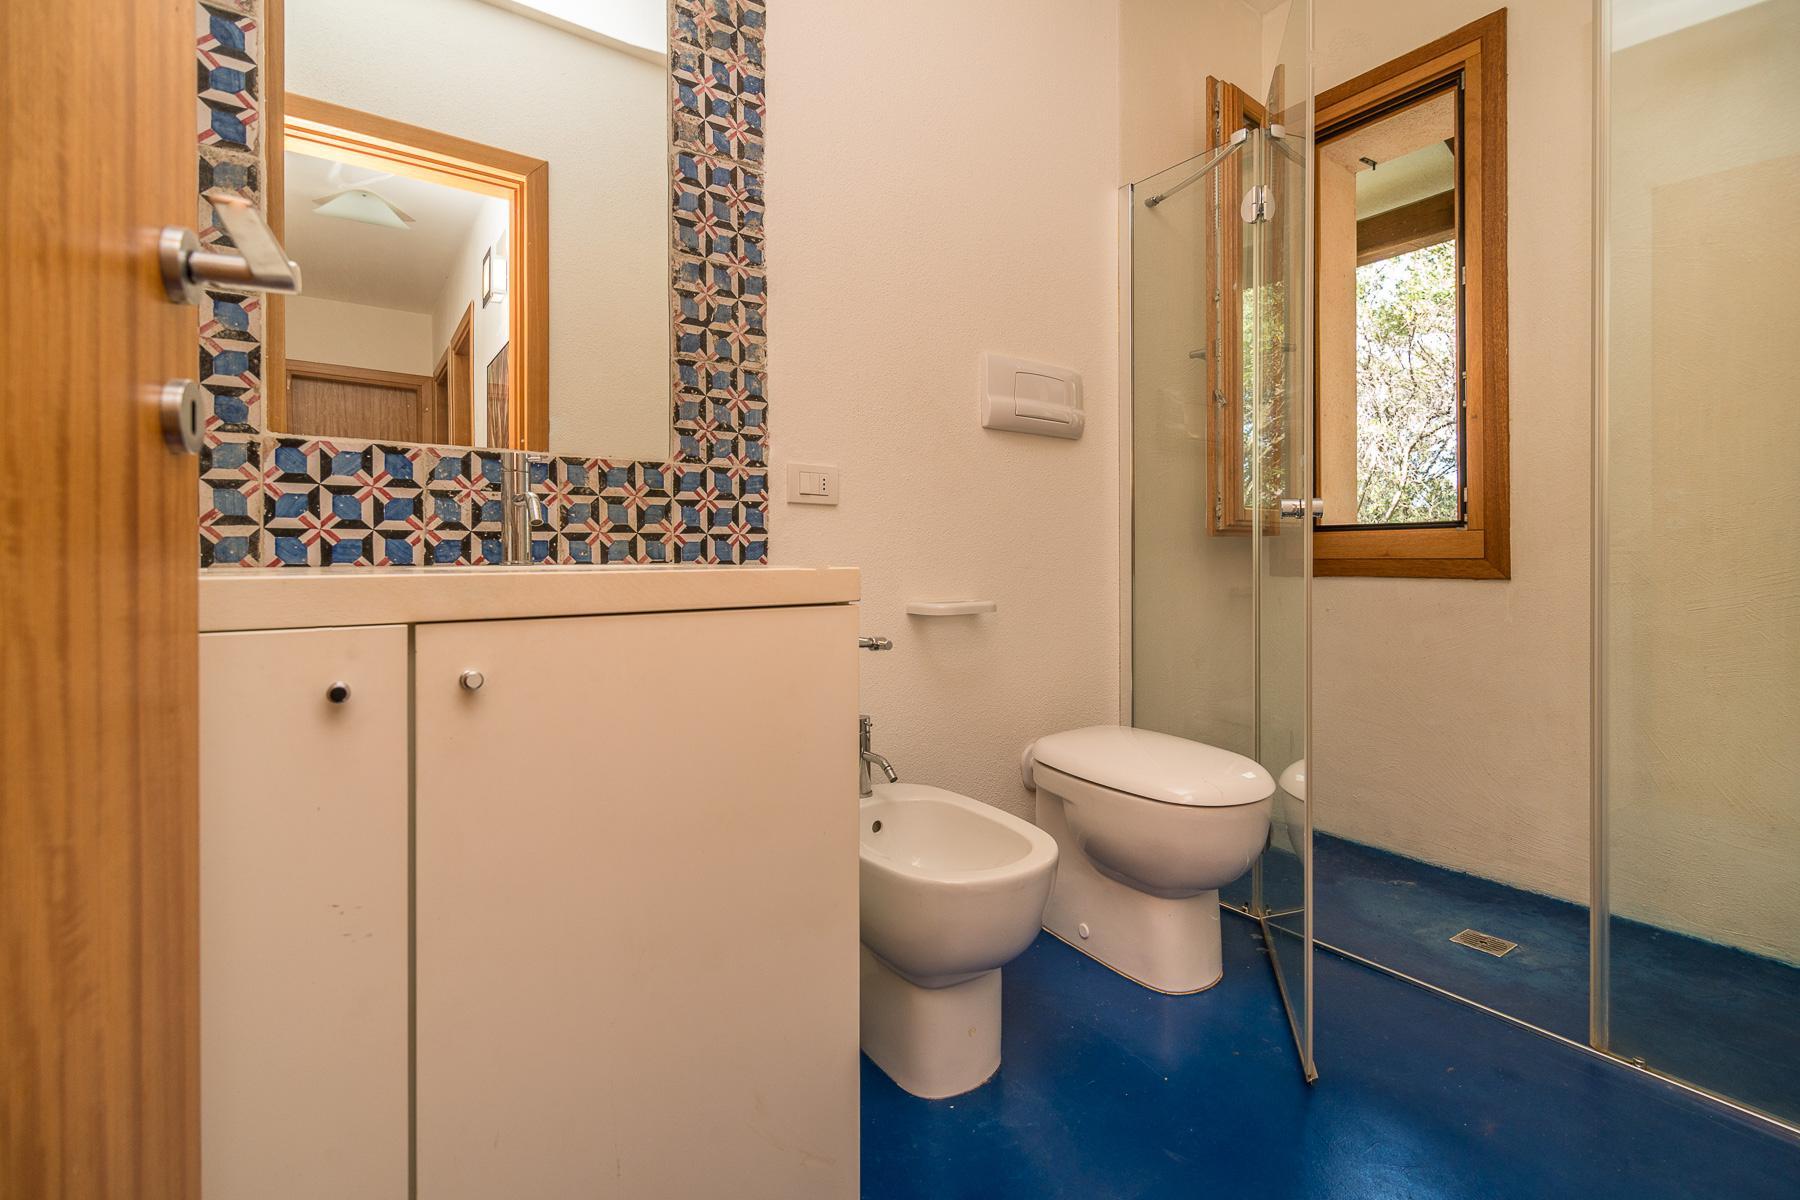 Golfo Aranci Sos Aranzos Wonderfull Villa with direct access to the beach - 12